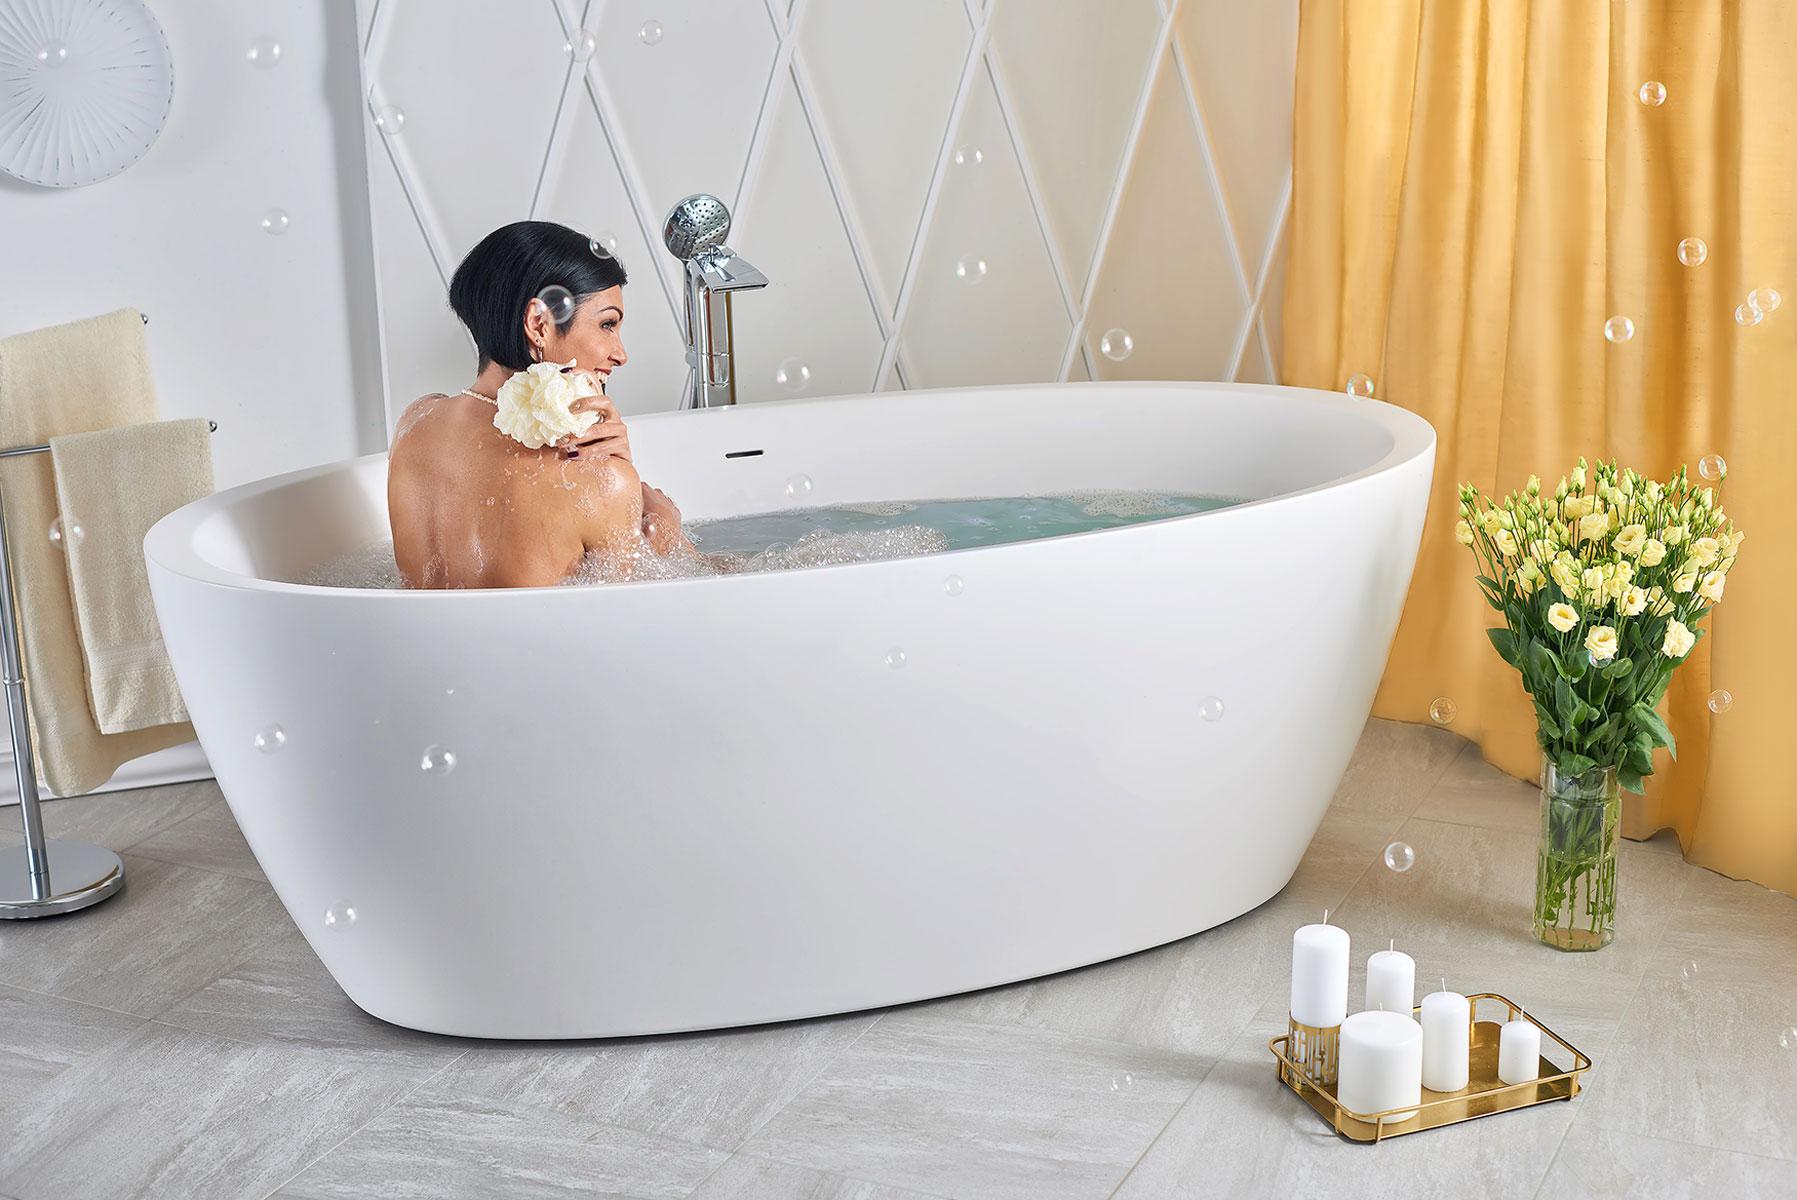 Vasca Da Bagno Freestanding 140 : Bagno con vasca freestanding moderna rifare casa